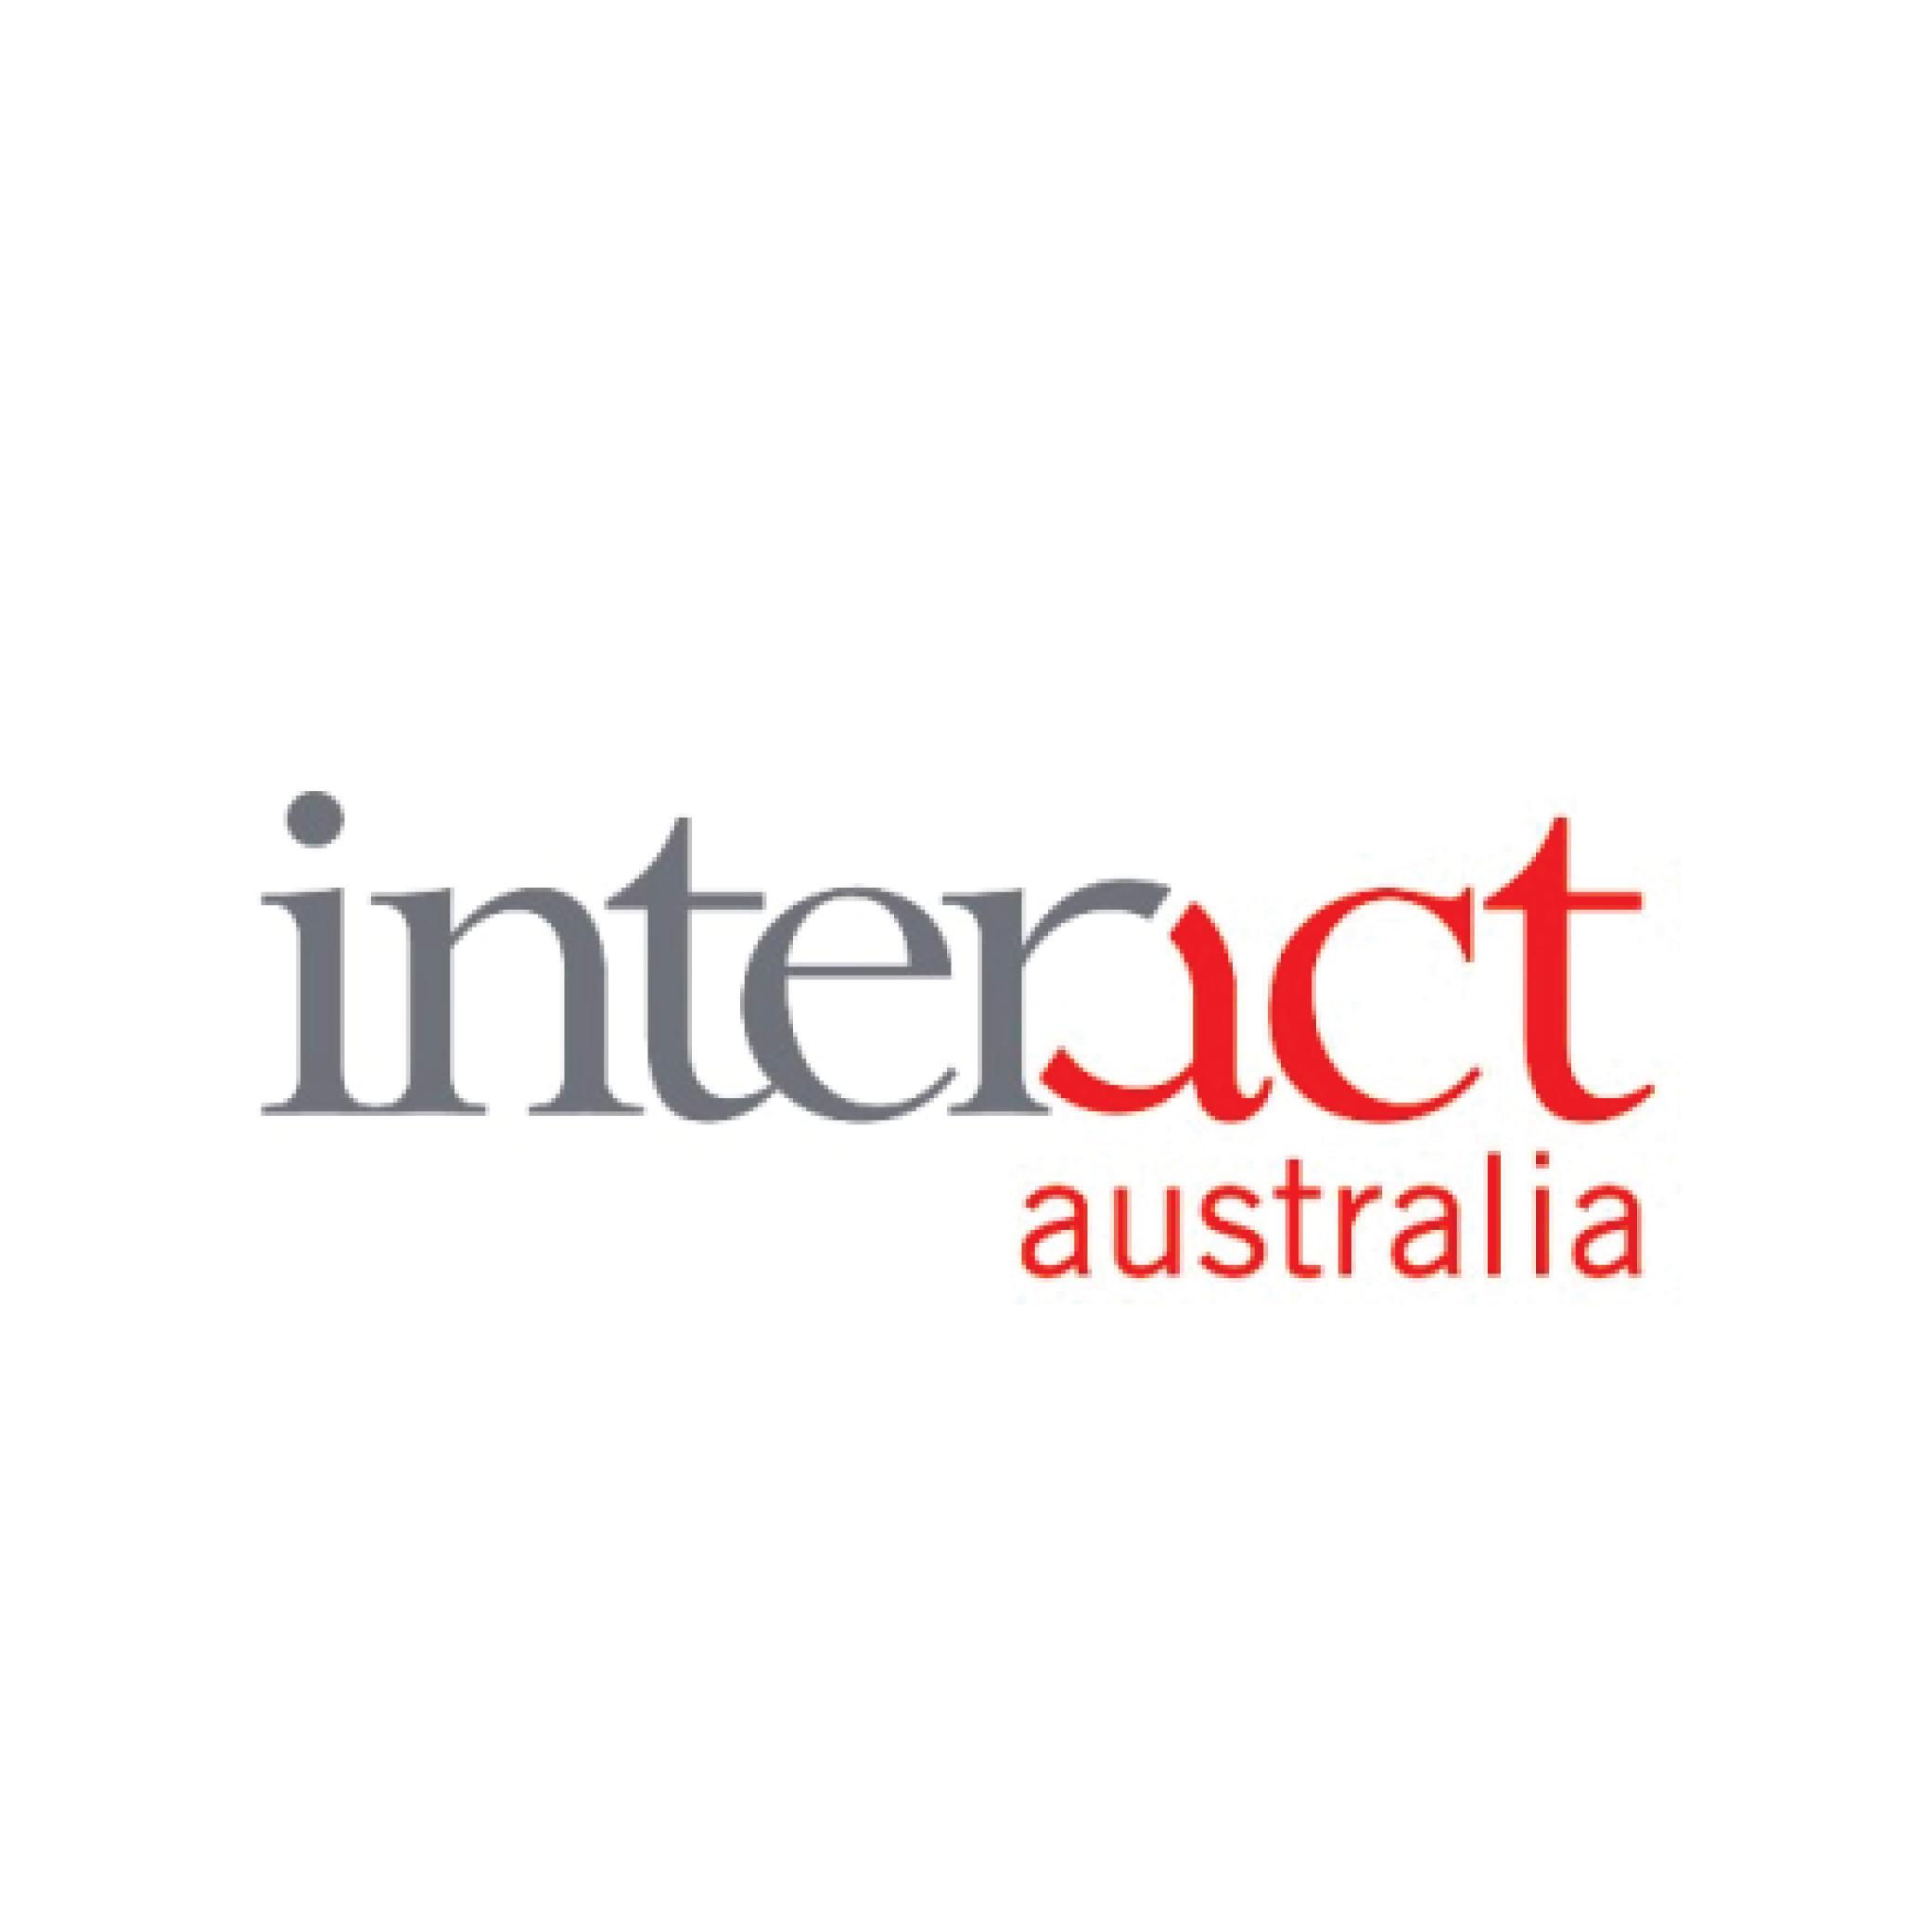 Interact Australia-01.png